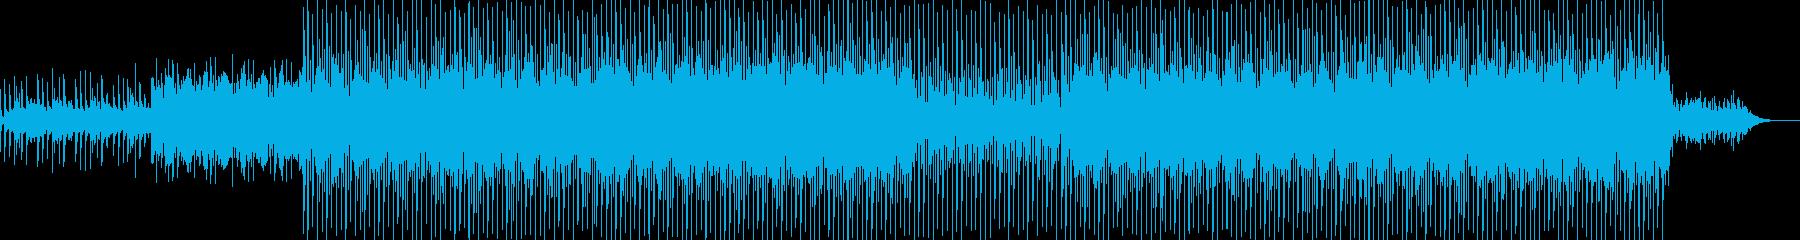 EDMクラブ系ダンスミュージック-27の再生済みの波形